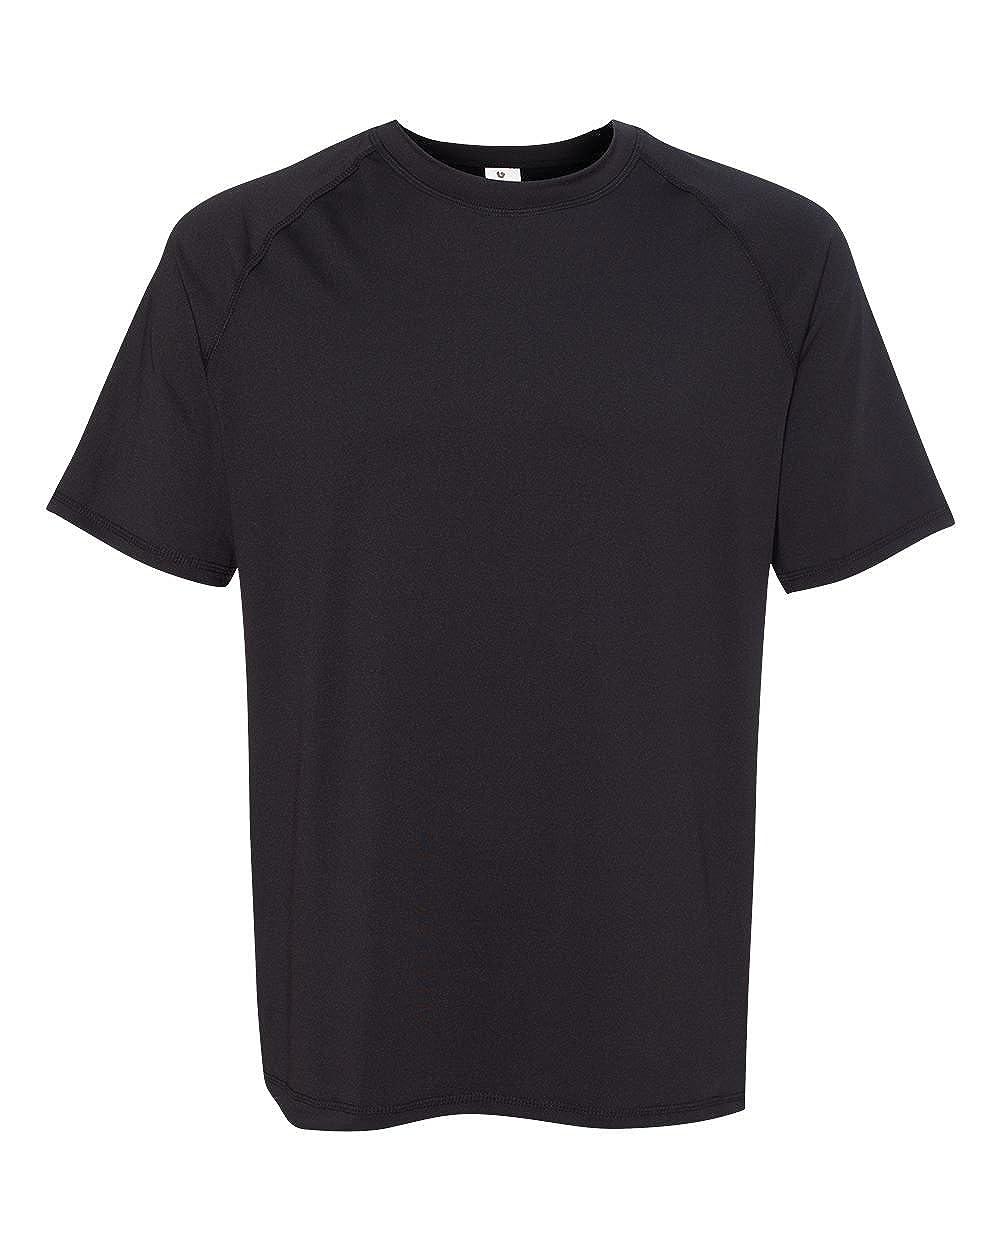 Rash Guard Shirt Burnside B9150